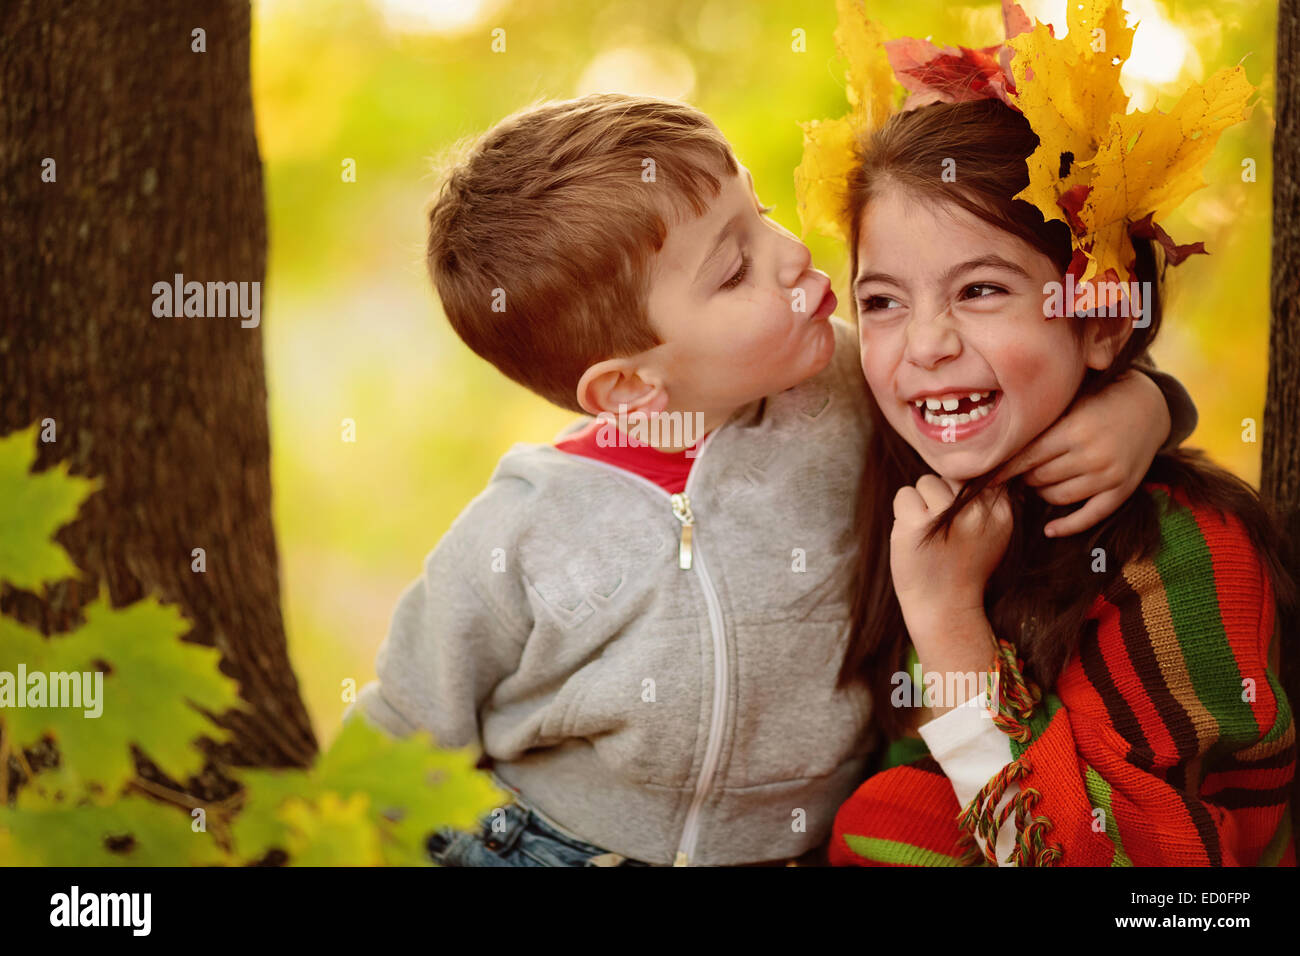 Girl Kissing Boy Stock Photos  Girl Kissing Boy Stock -9302